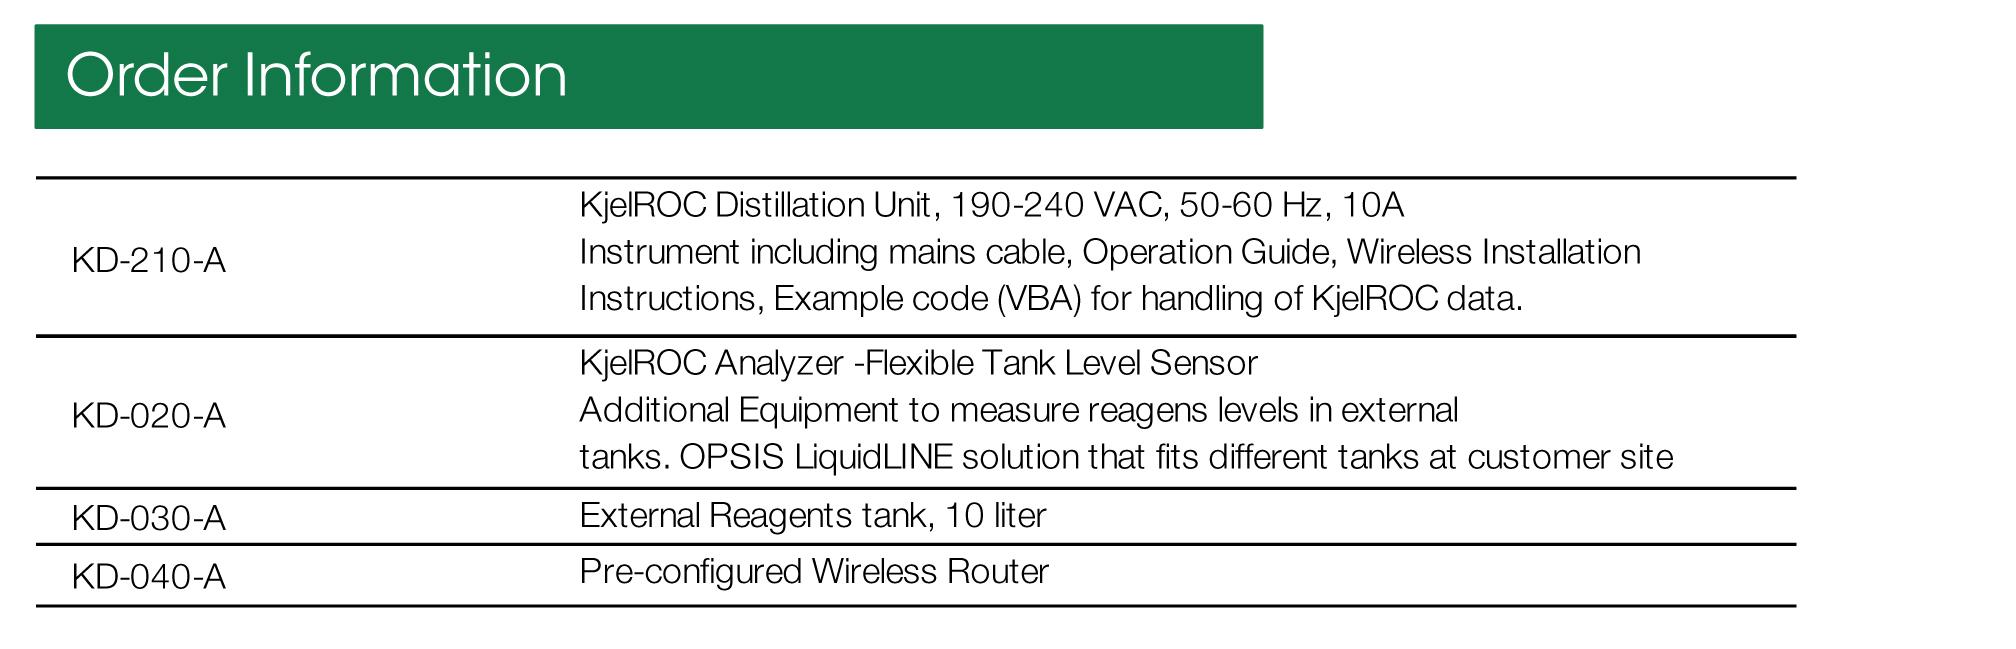 SalesSheet KD-210-A 20130319